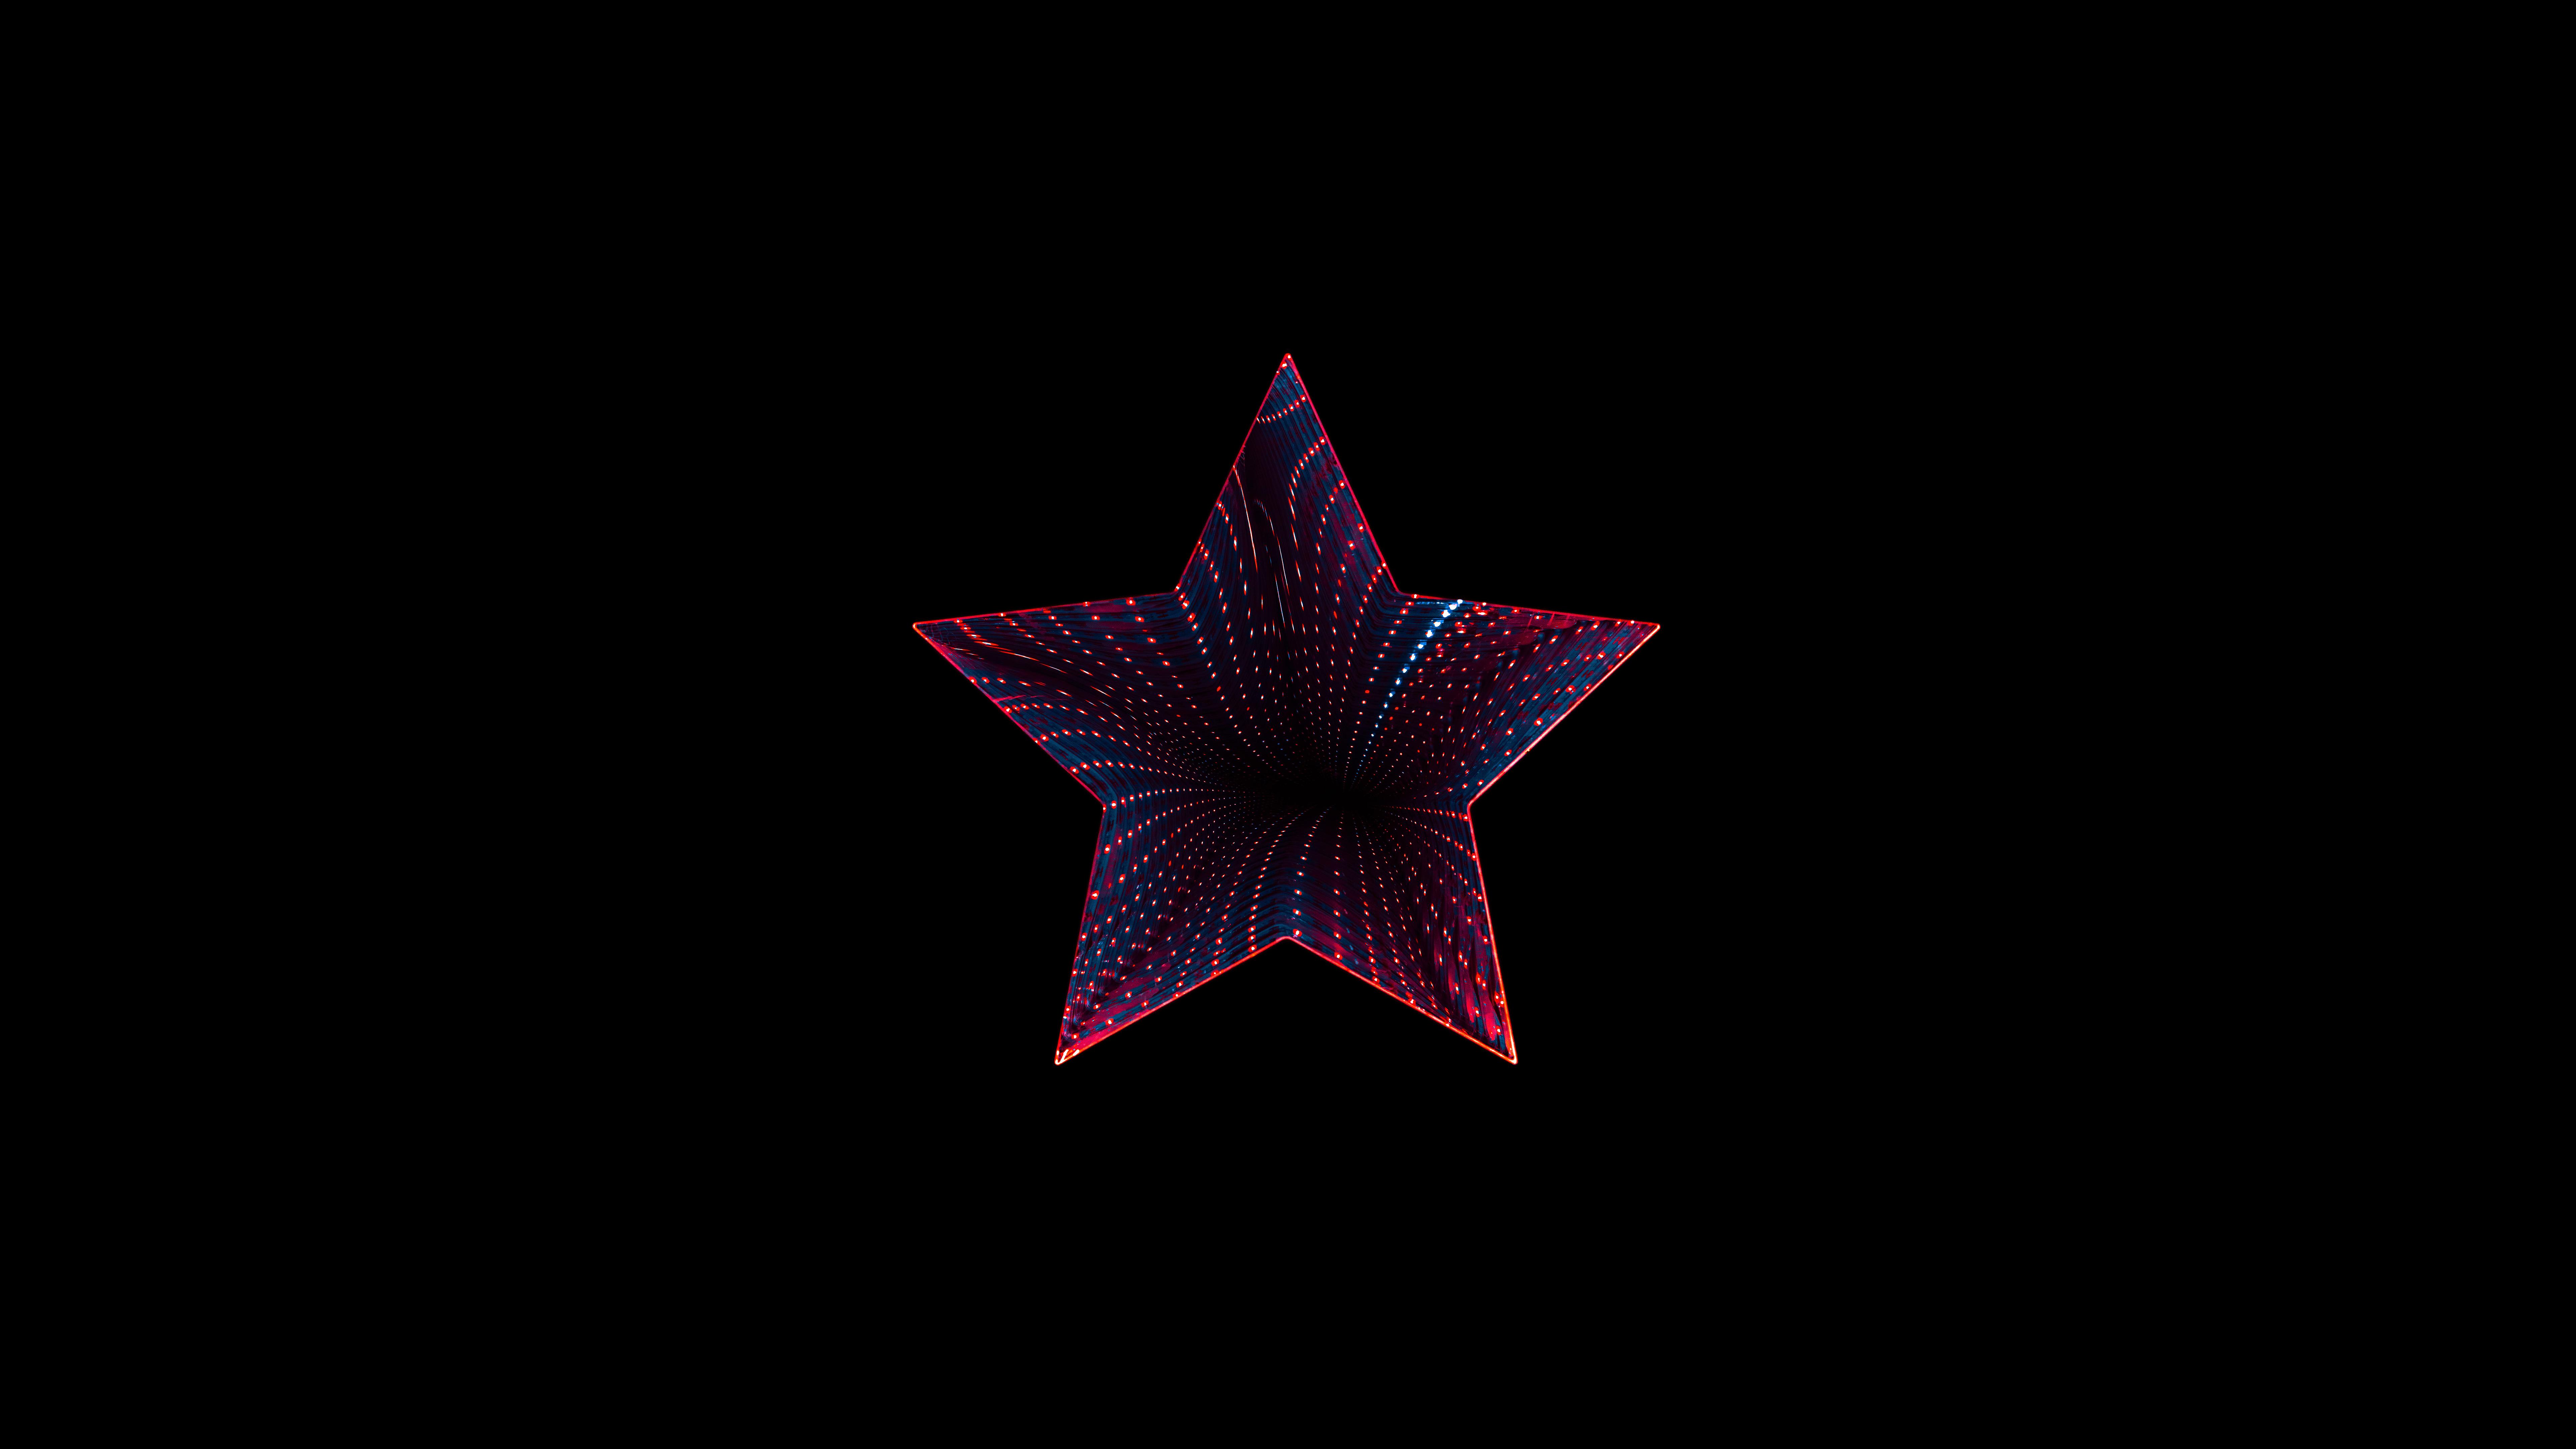 star neon black background 5k 8k 7680x4320 1508